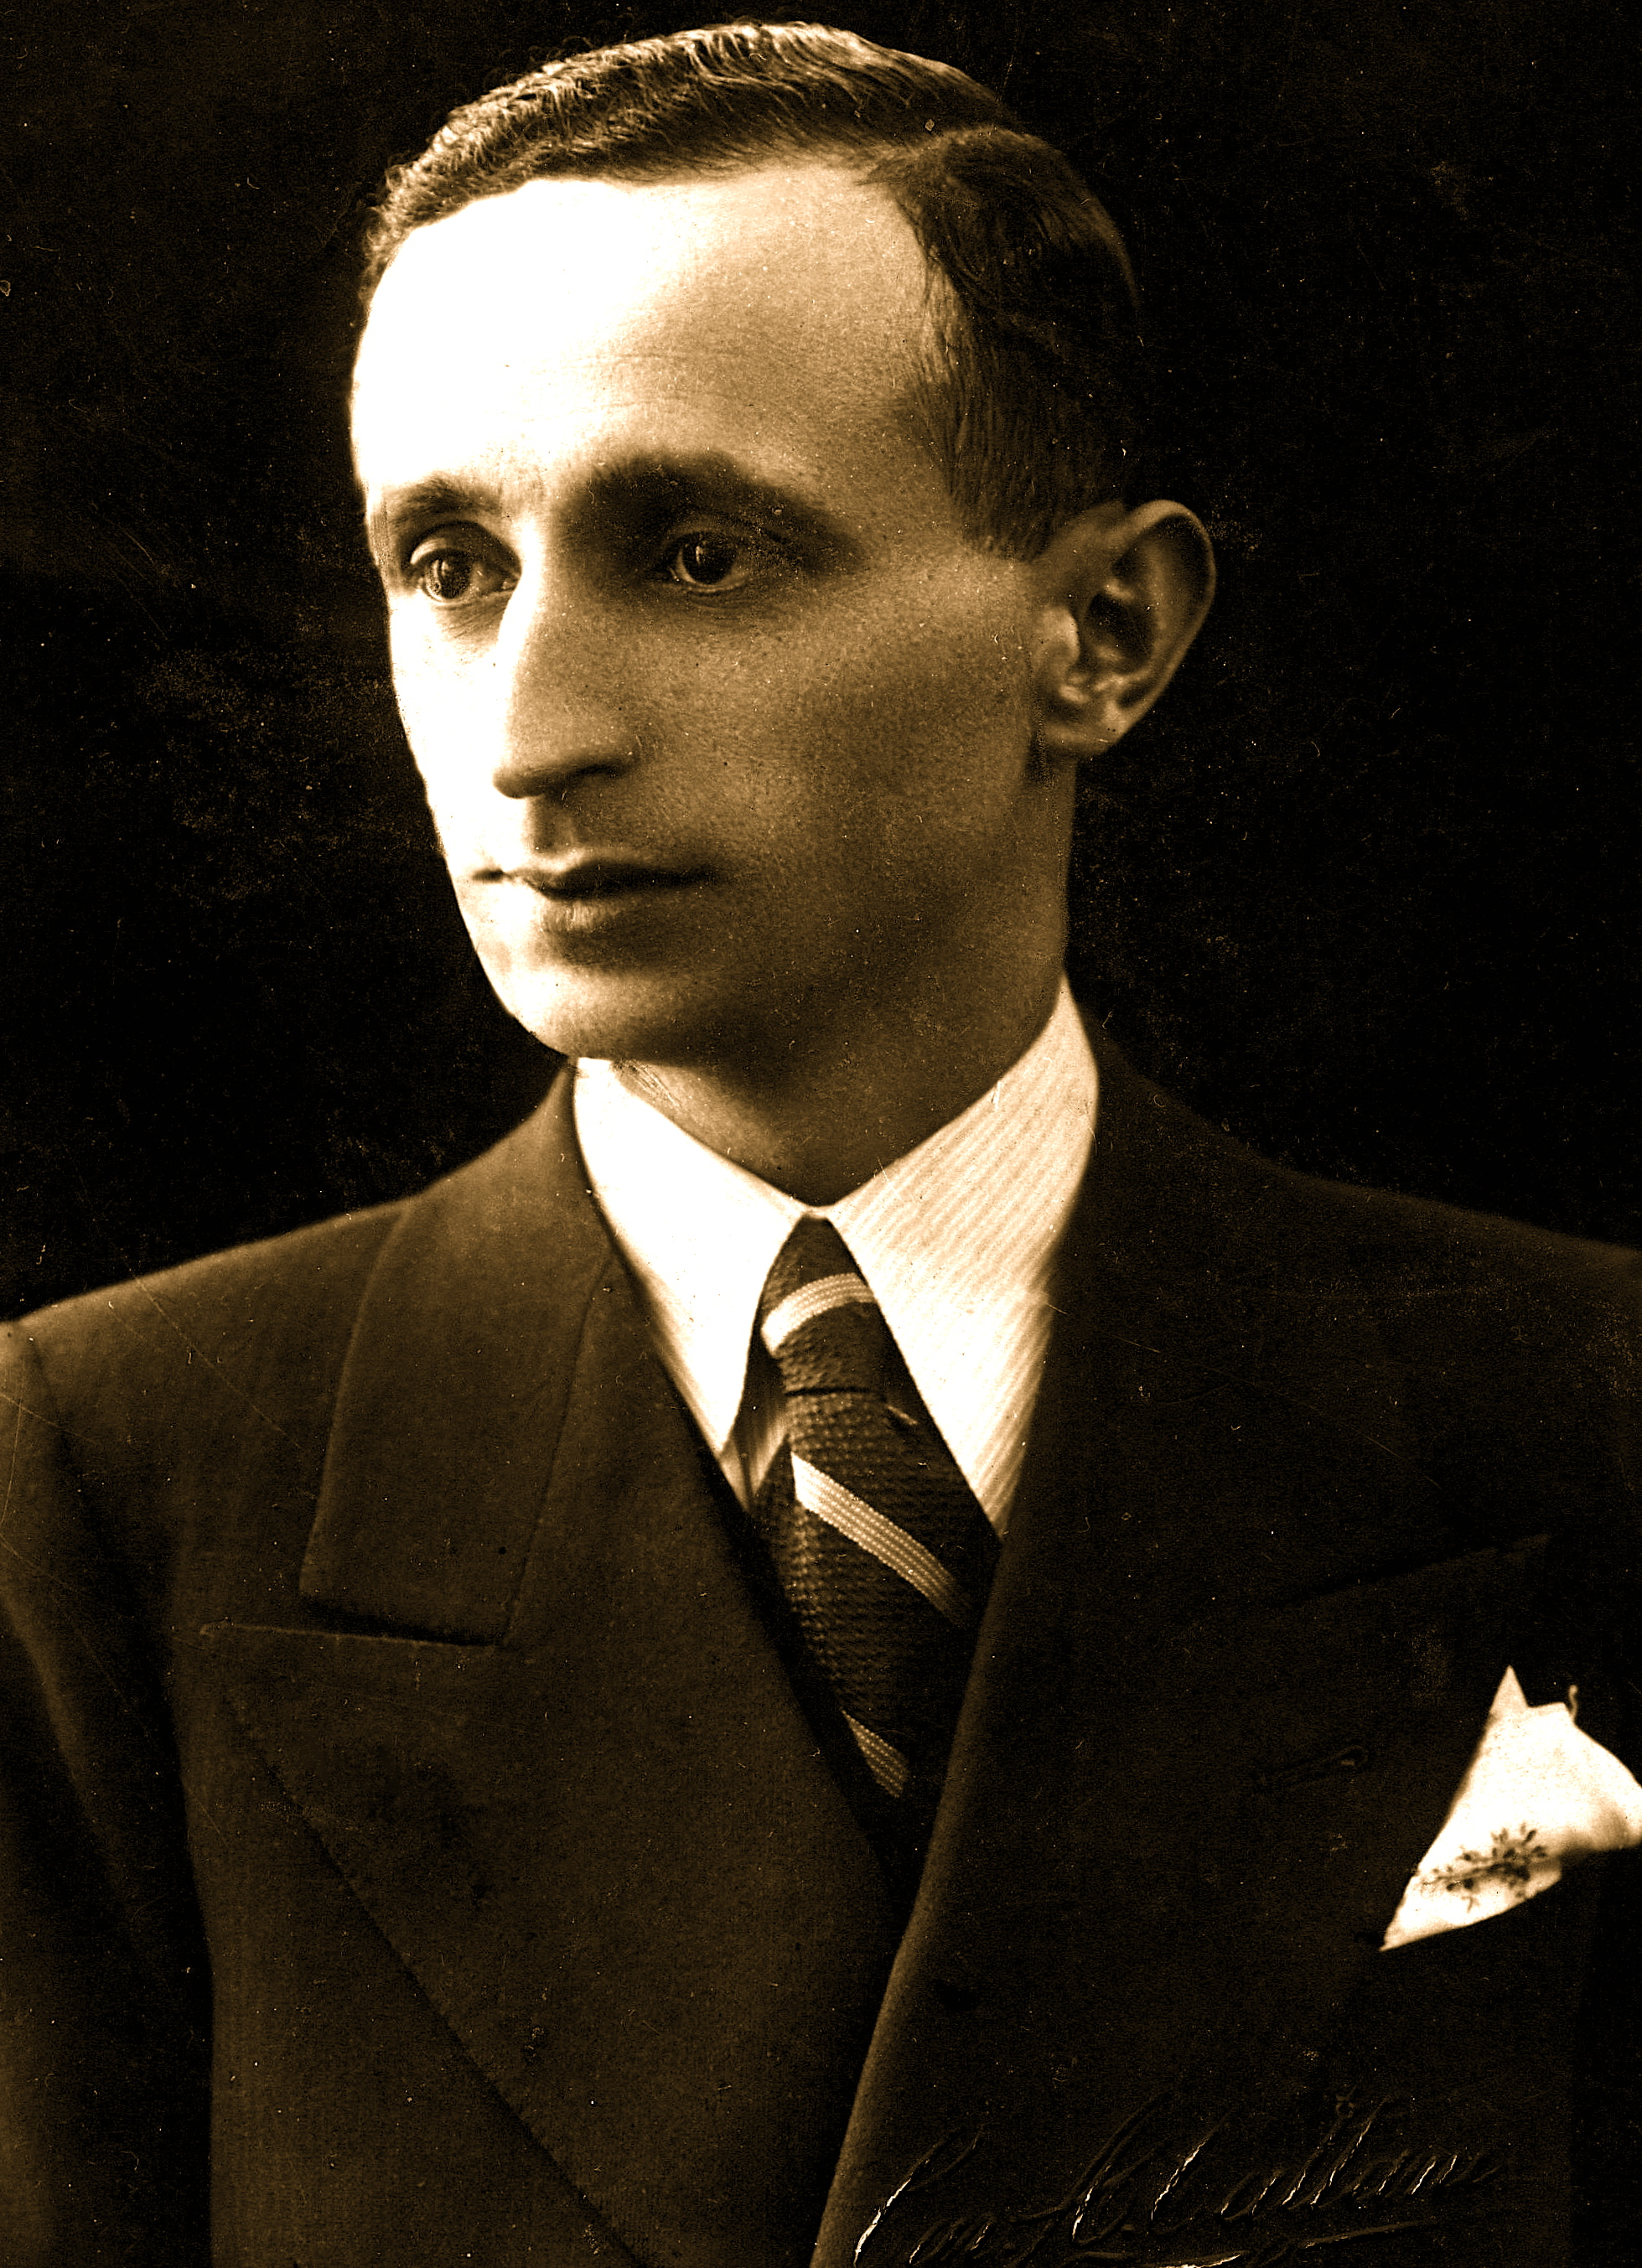 Ali Hashorva